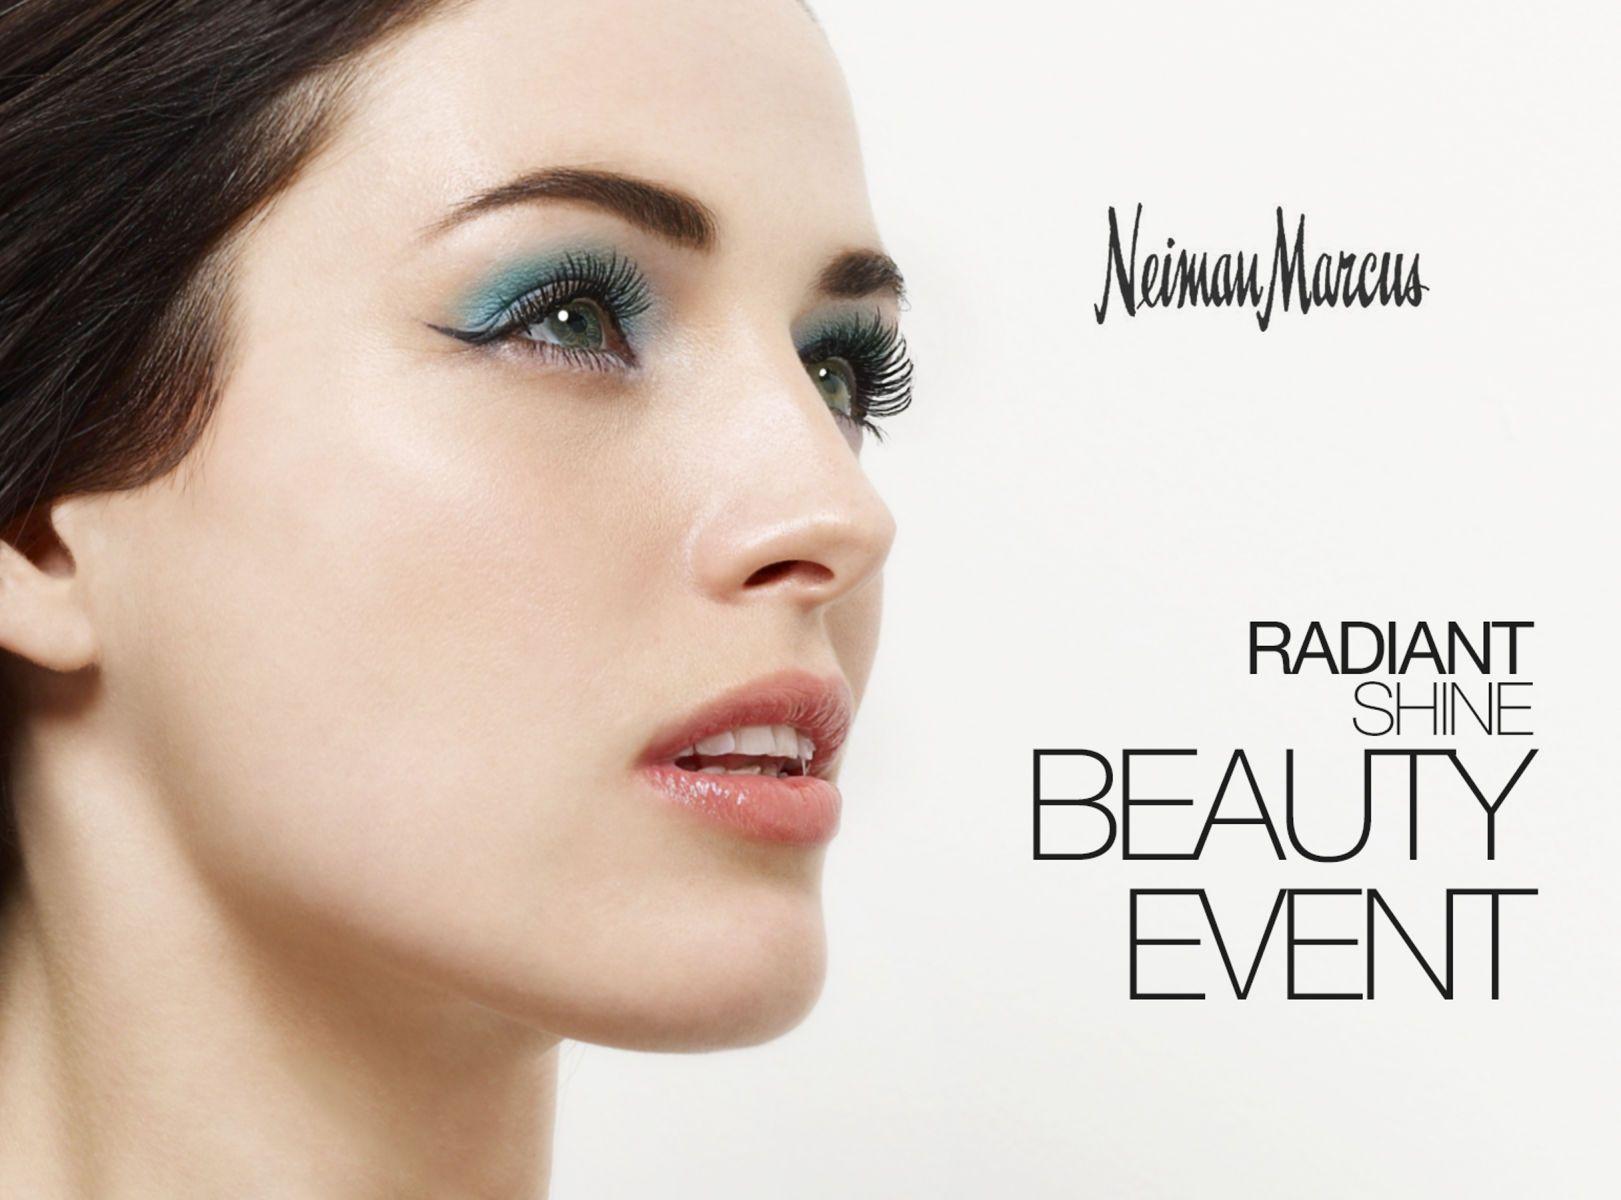 Neiman Marcus Radiant Shine Beauty Event